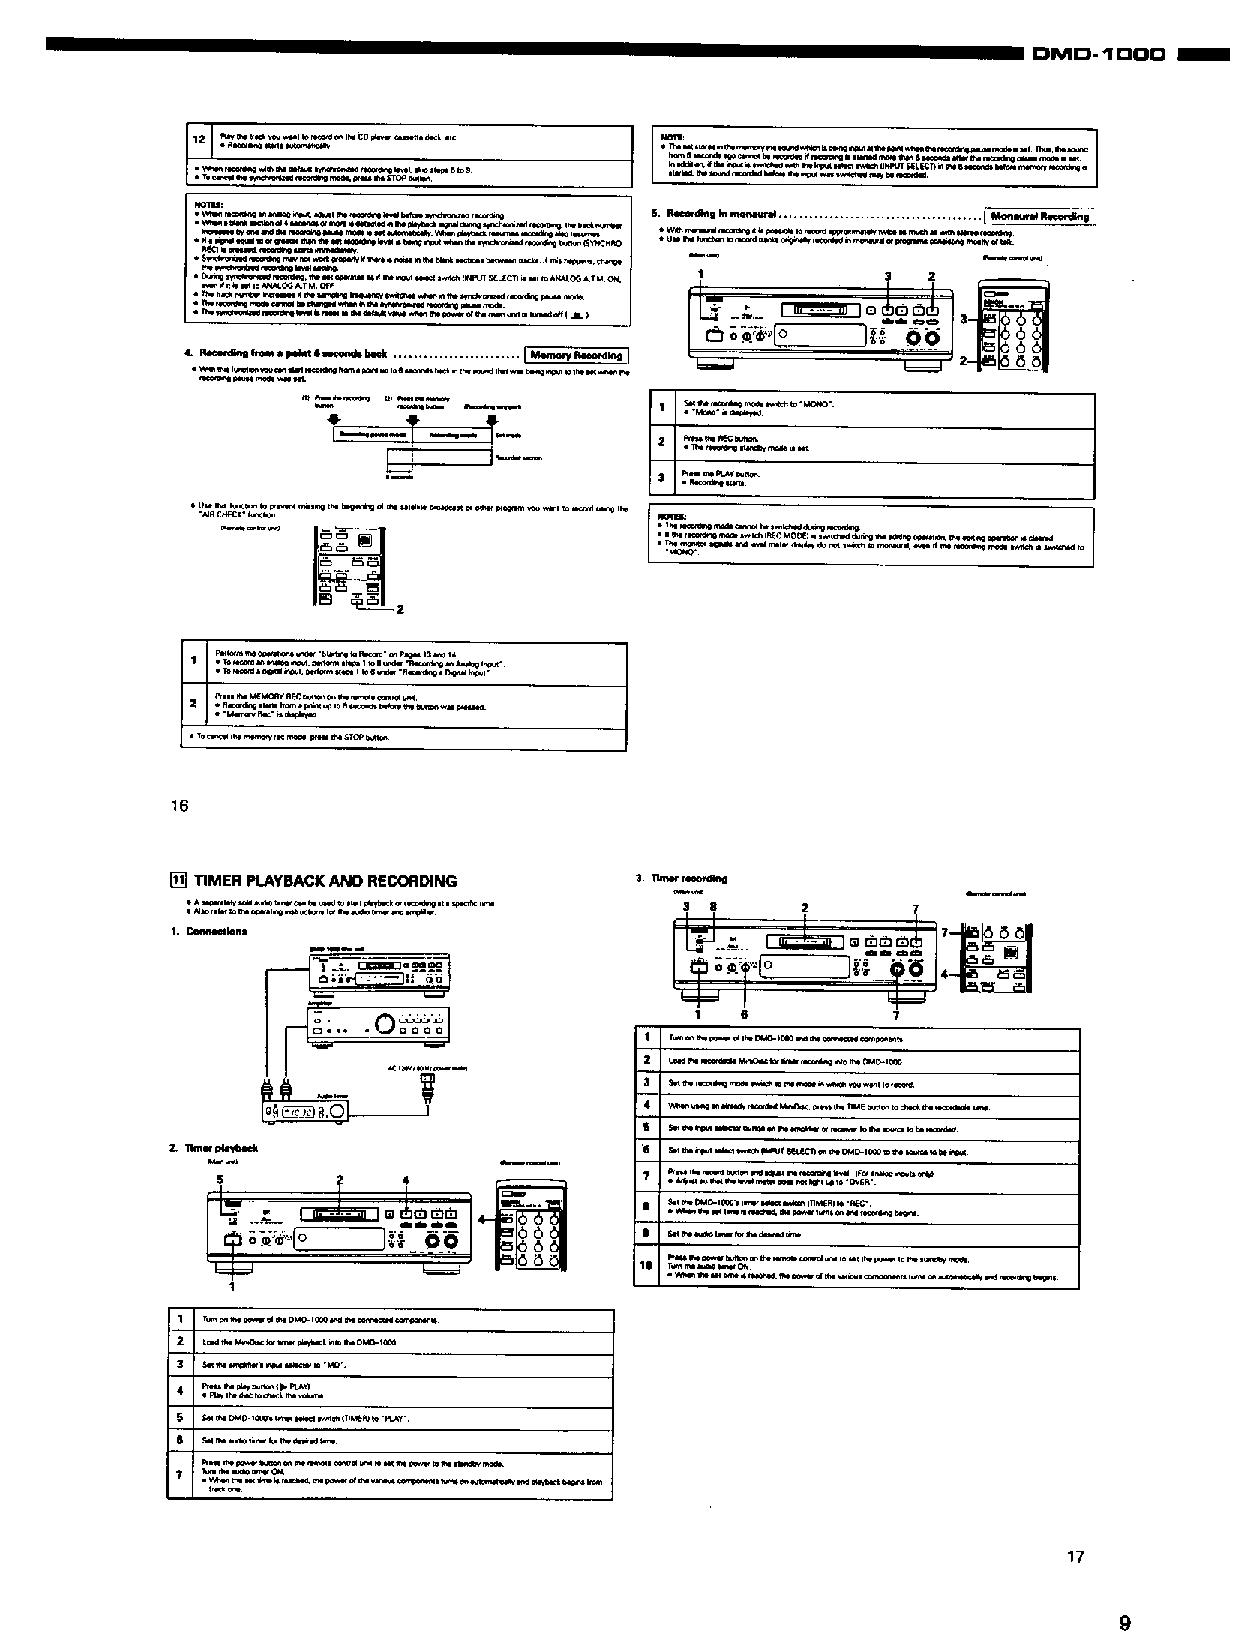 Denon DMD-1000 Service Manual